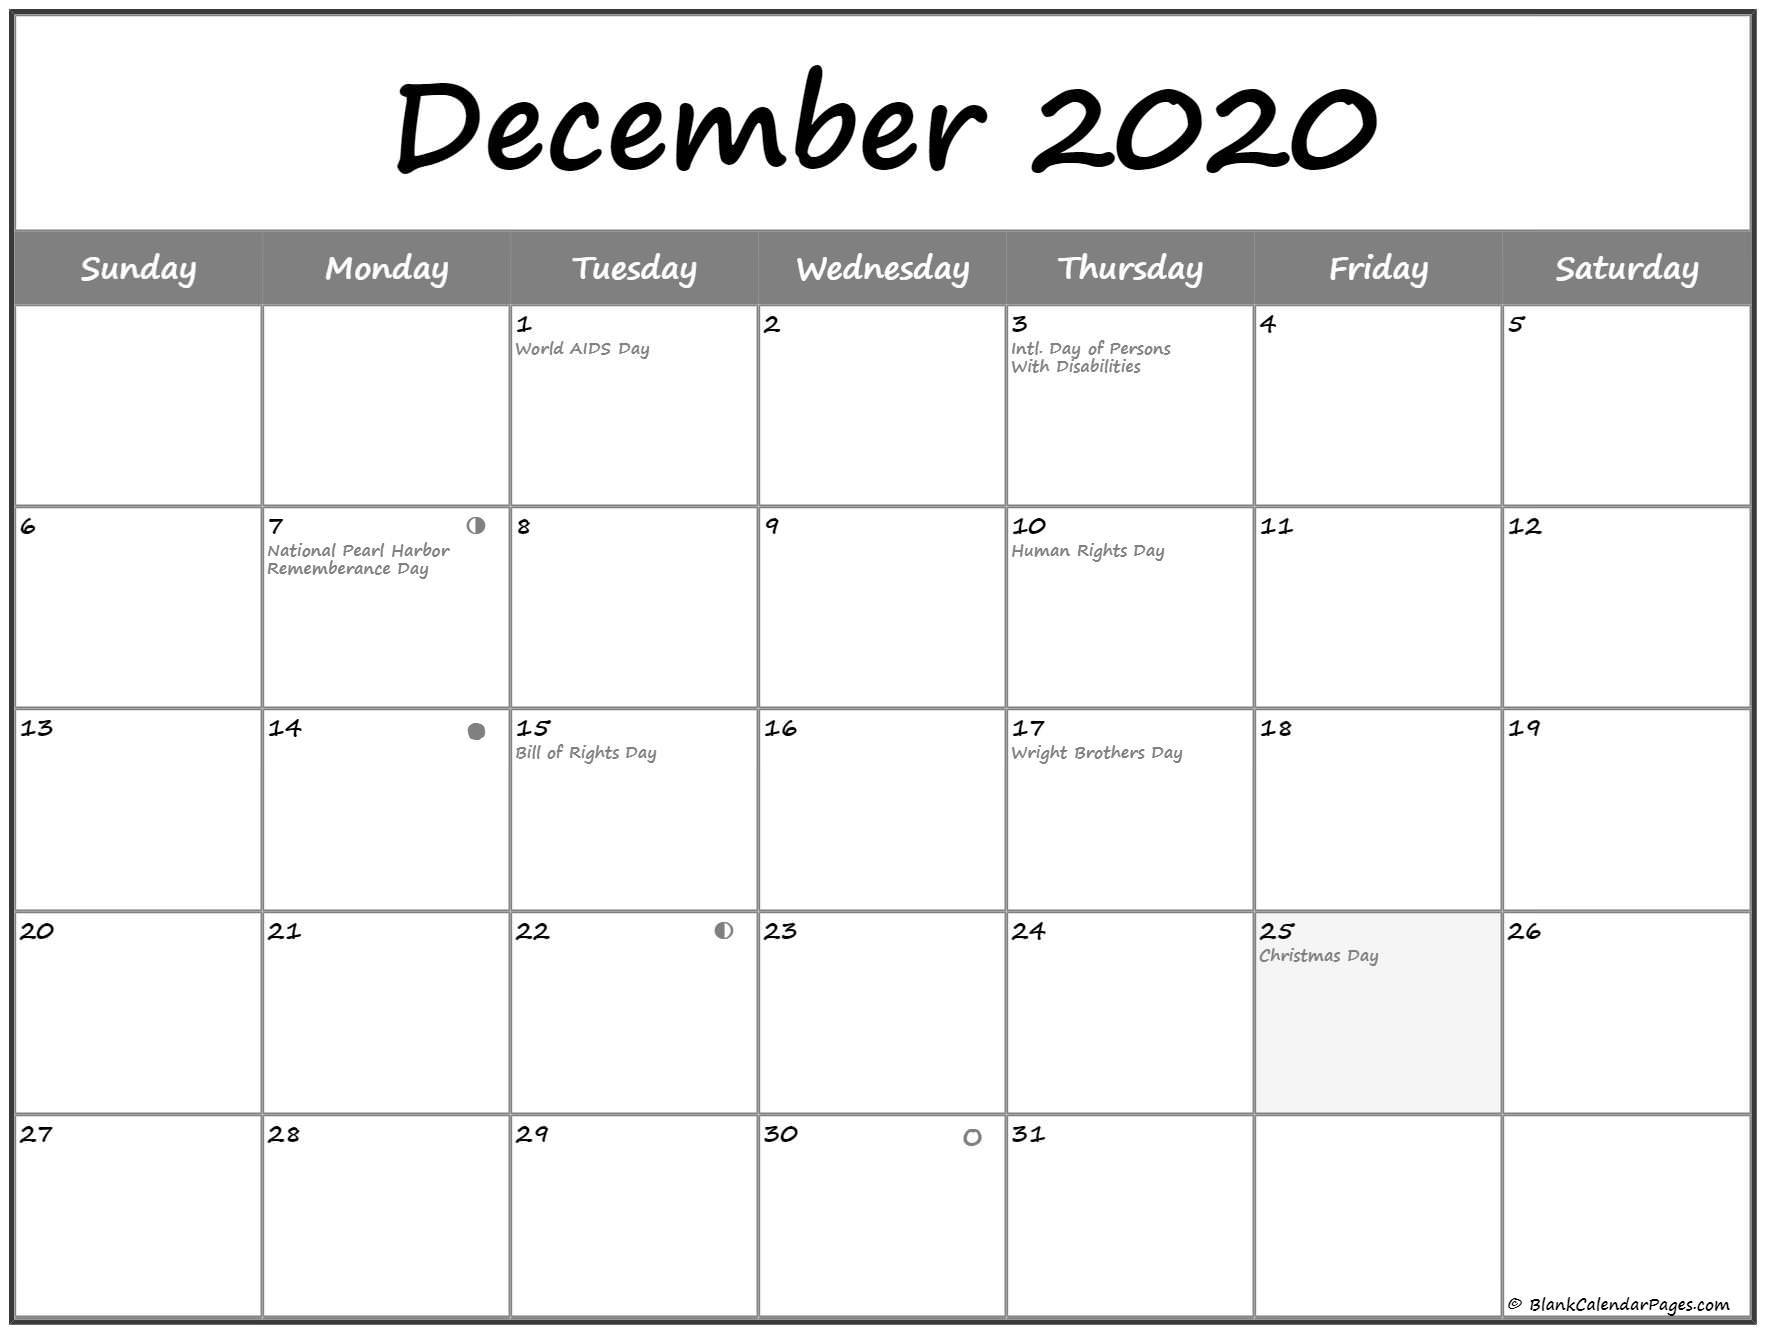 December 2020 Lunar Calendar | Moon Phase Calendar  Solar Lunar Calendar - 2020